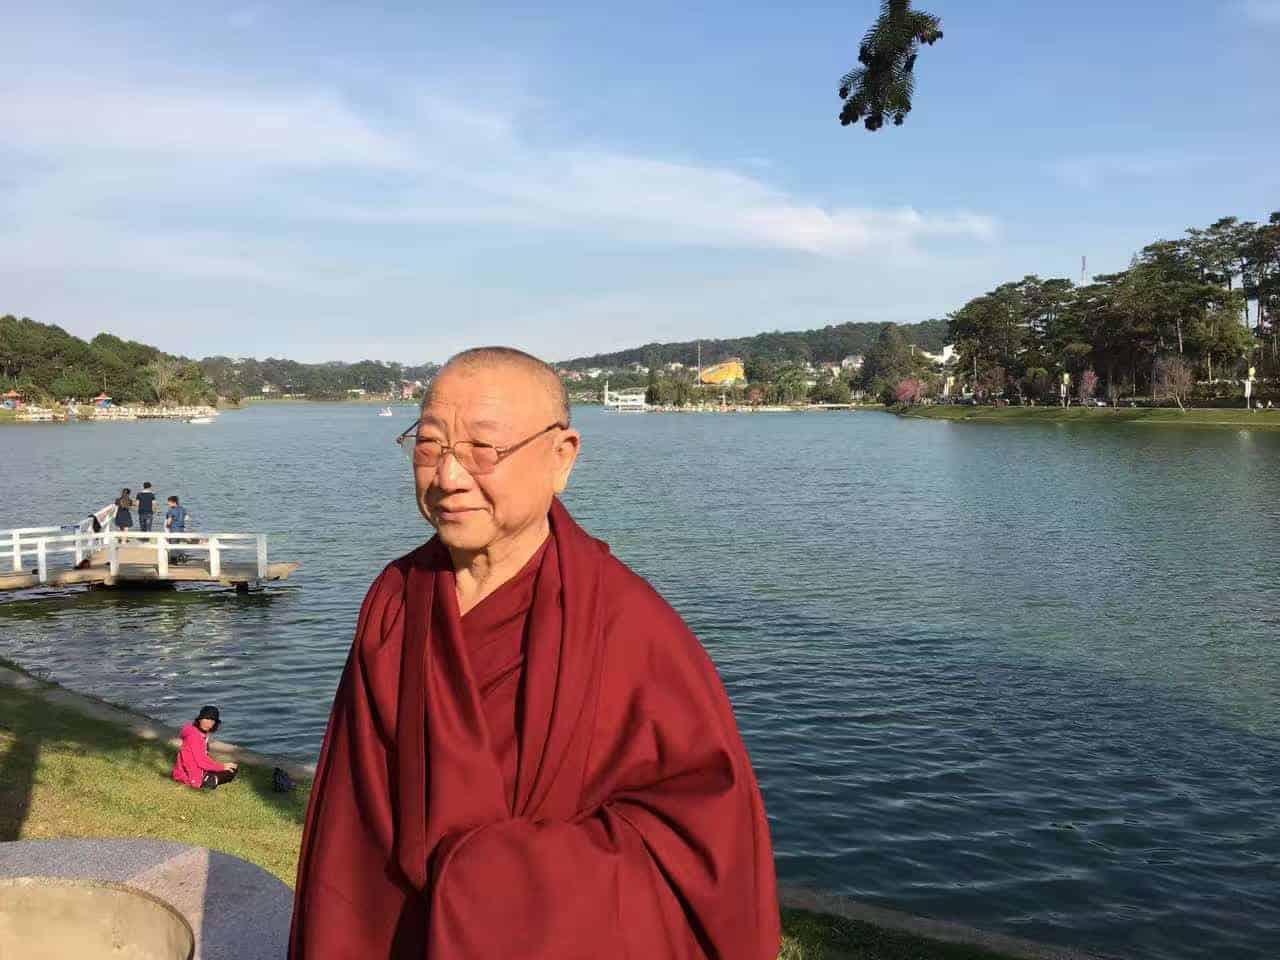 Gosok Rinpoche Vietnam 2017-03-07 df77137716757399d117b7f5115952e